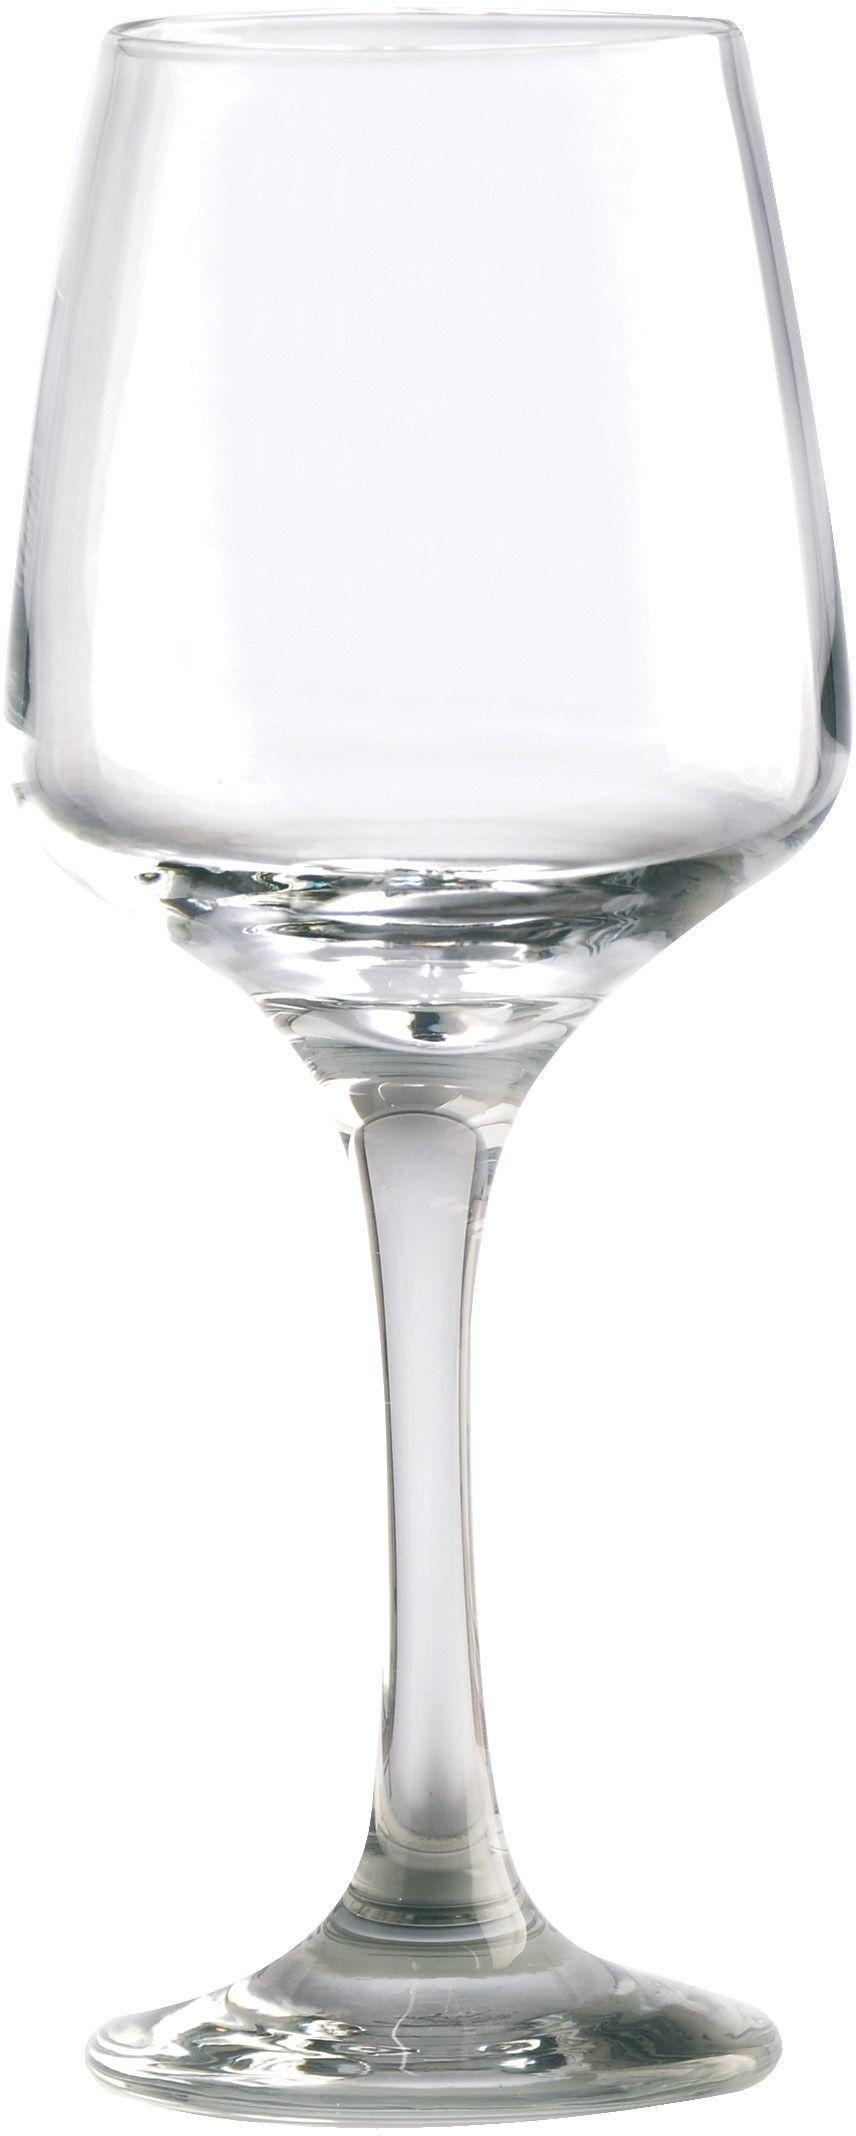 White apron asda - Buy Or Reserve More Details On Ravenhead Nova Set Of 4 Red Wine Glasses